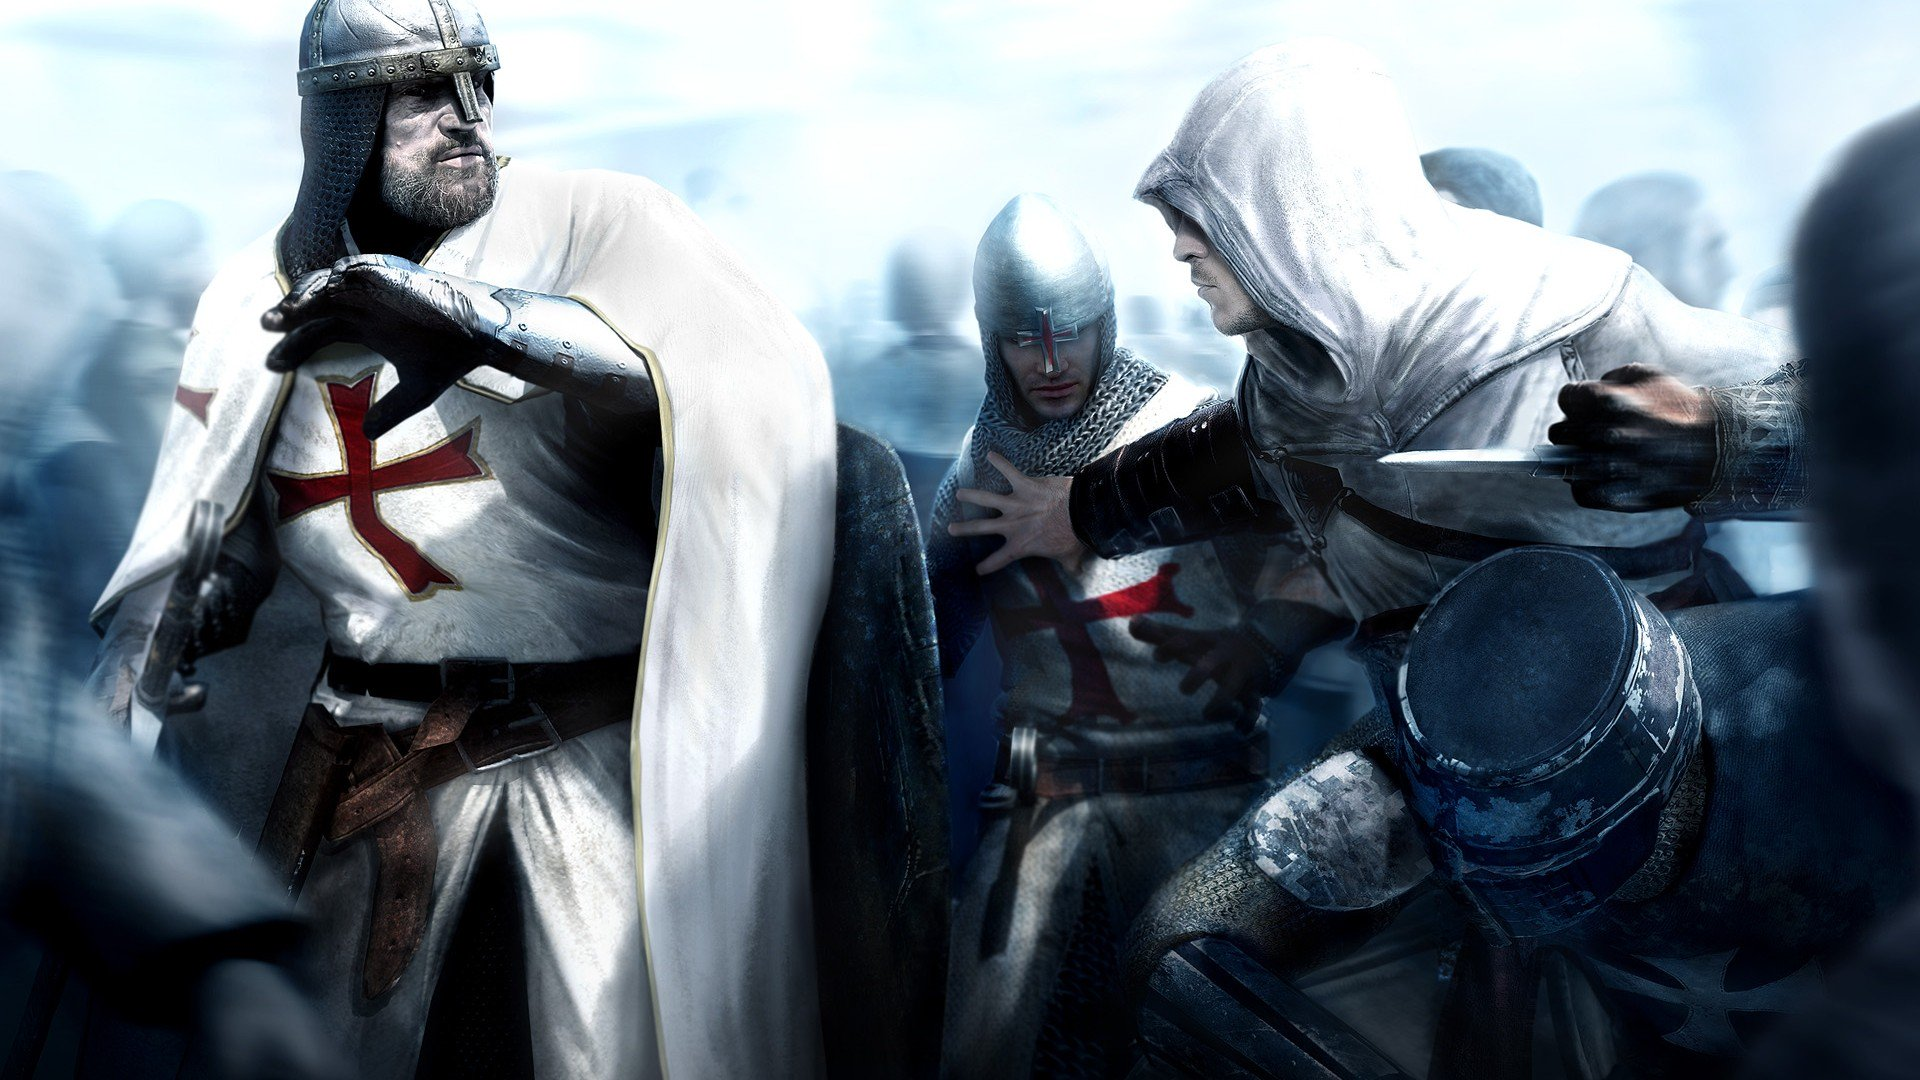 �� Happy birthday to the legendary Altaïr Ibn-La'Ahad! ���� https://t.co/pejYBPmMwl